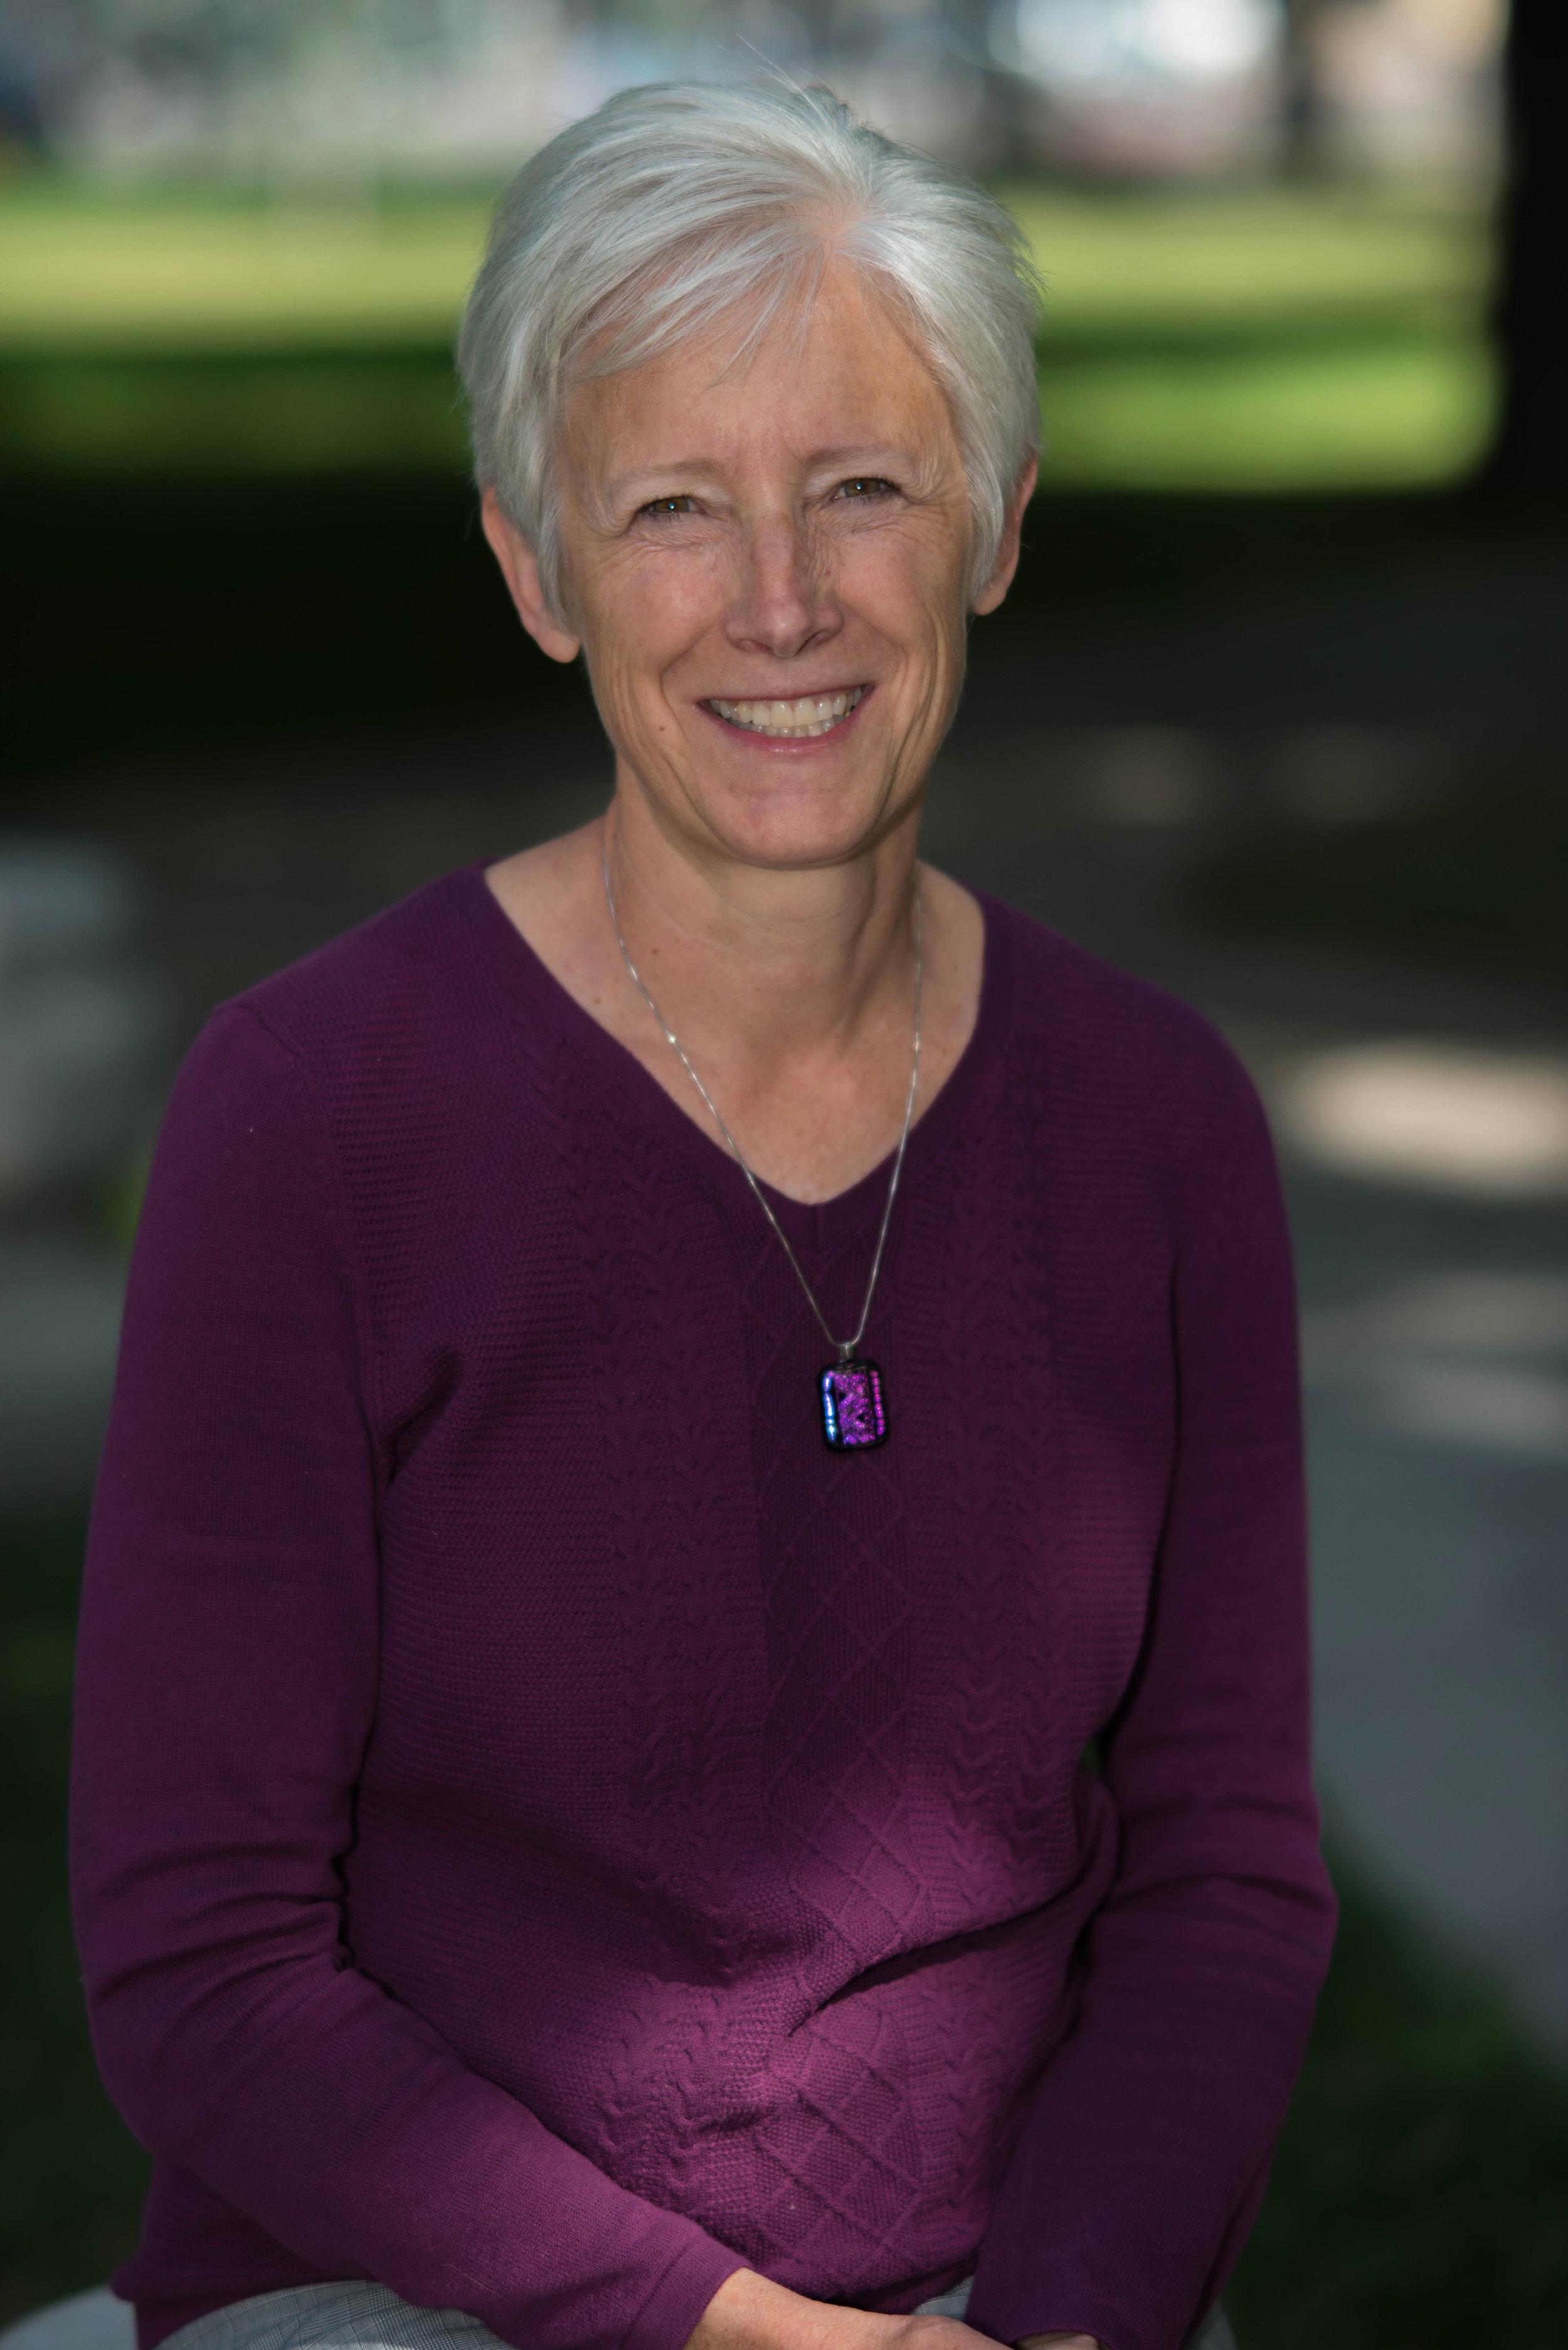 Vicki Bennett - Director of Sustainability at Salt Lake City